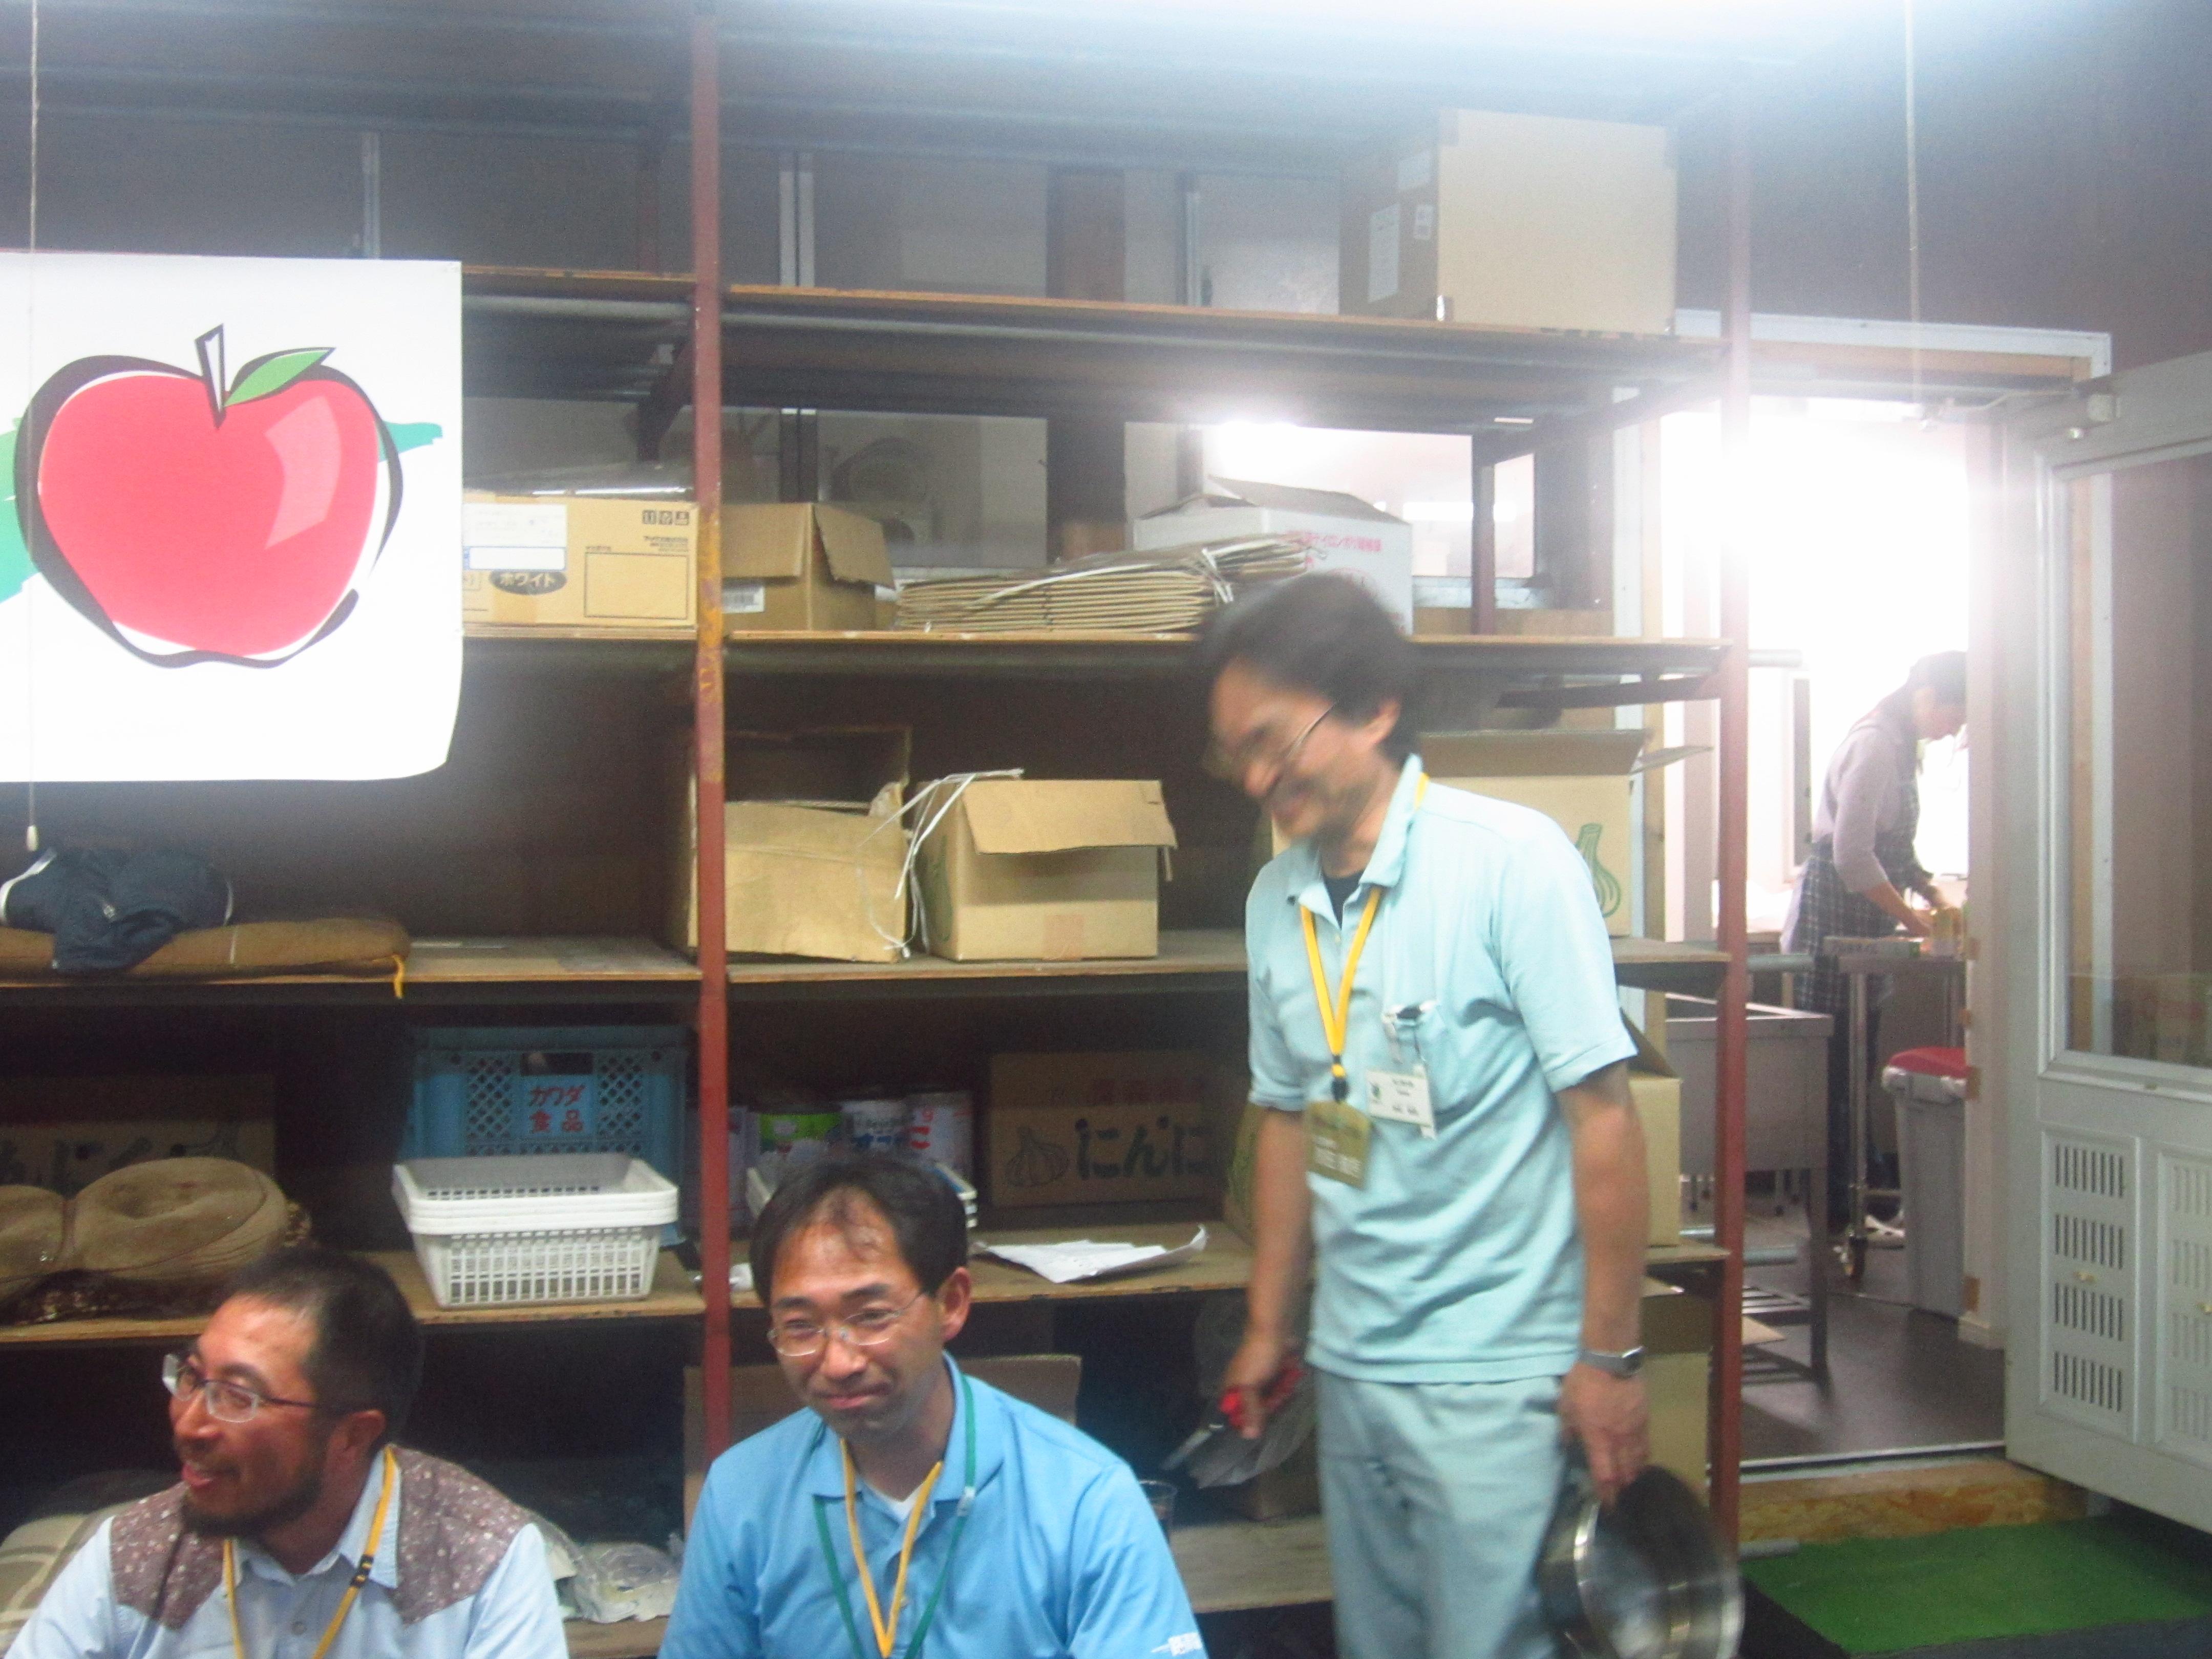 IMG 4412 - 麻布十番納涼祭り25,26日(七戸町出店)